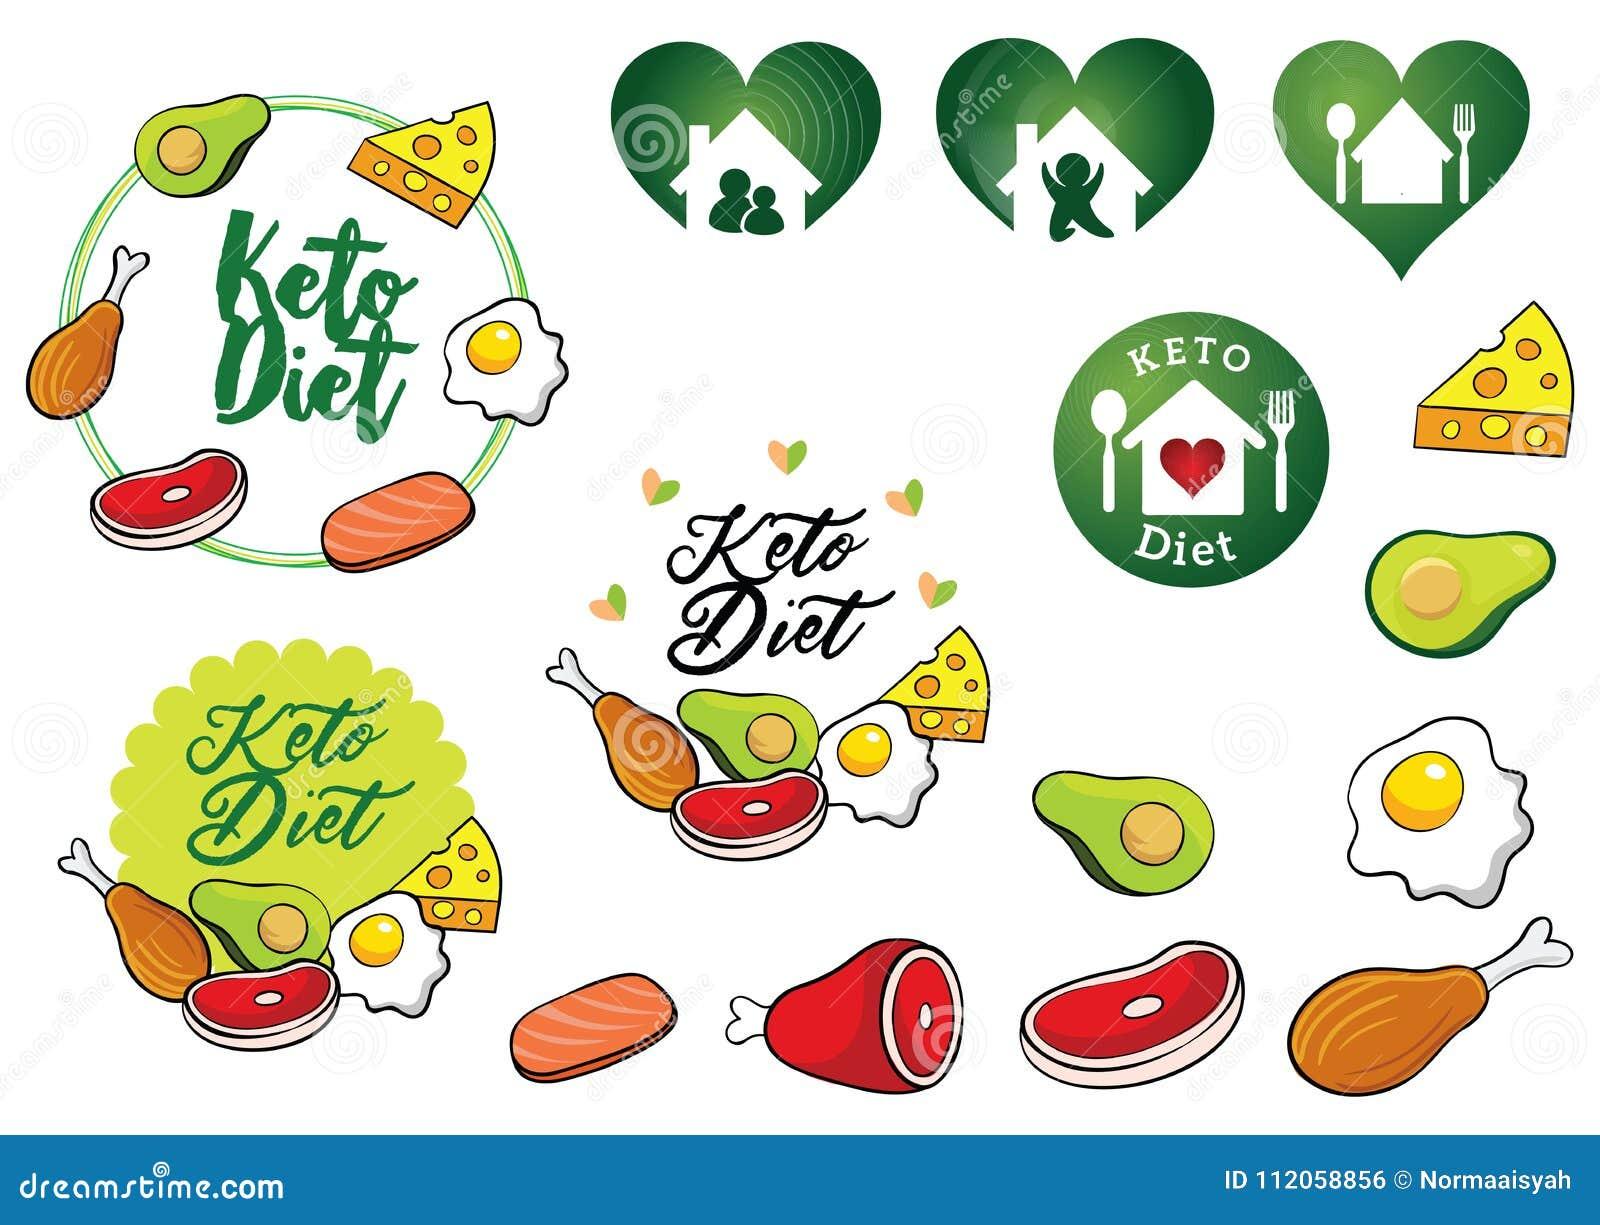 Blog dieta ketogenica